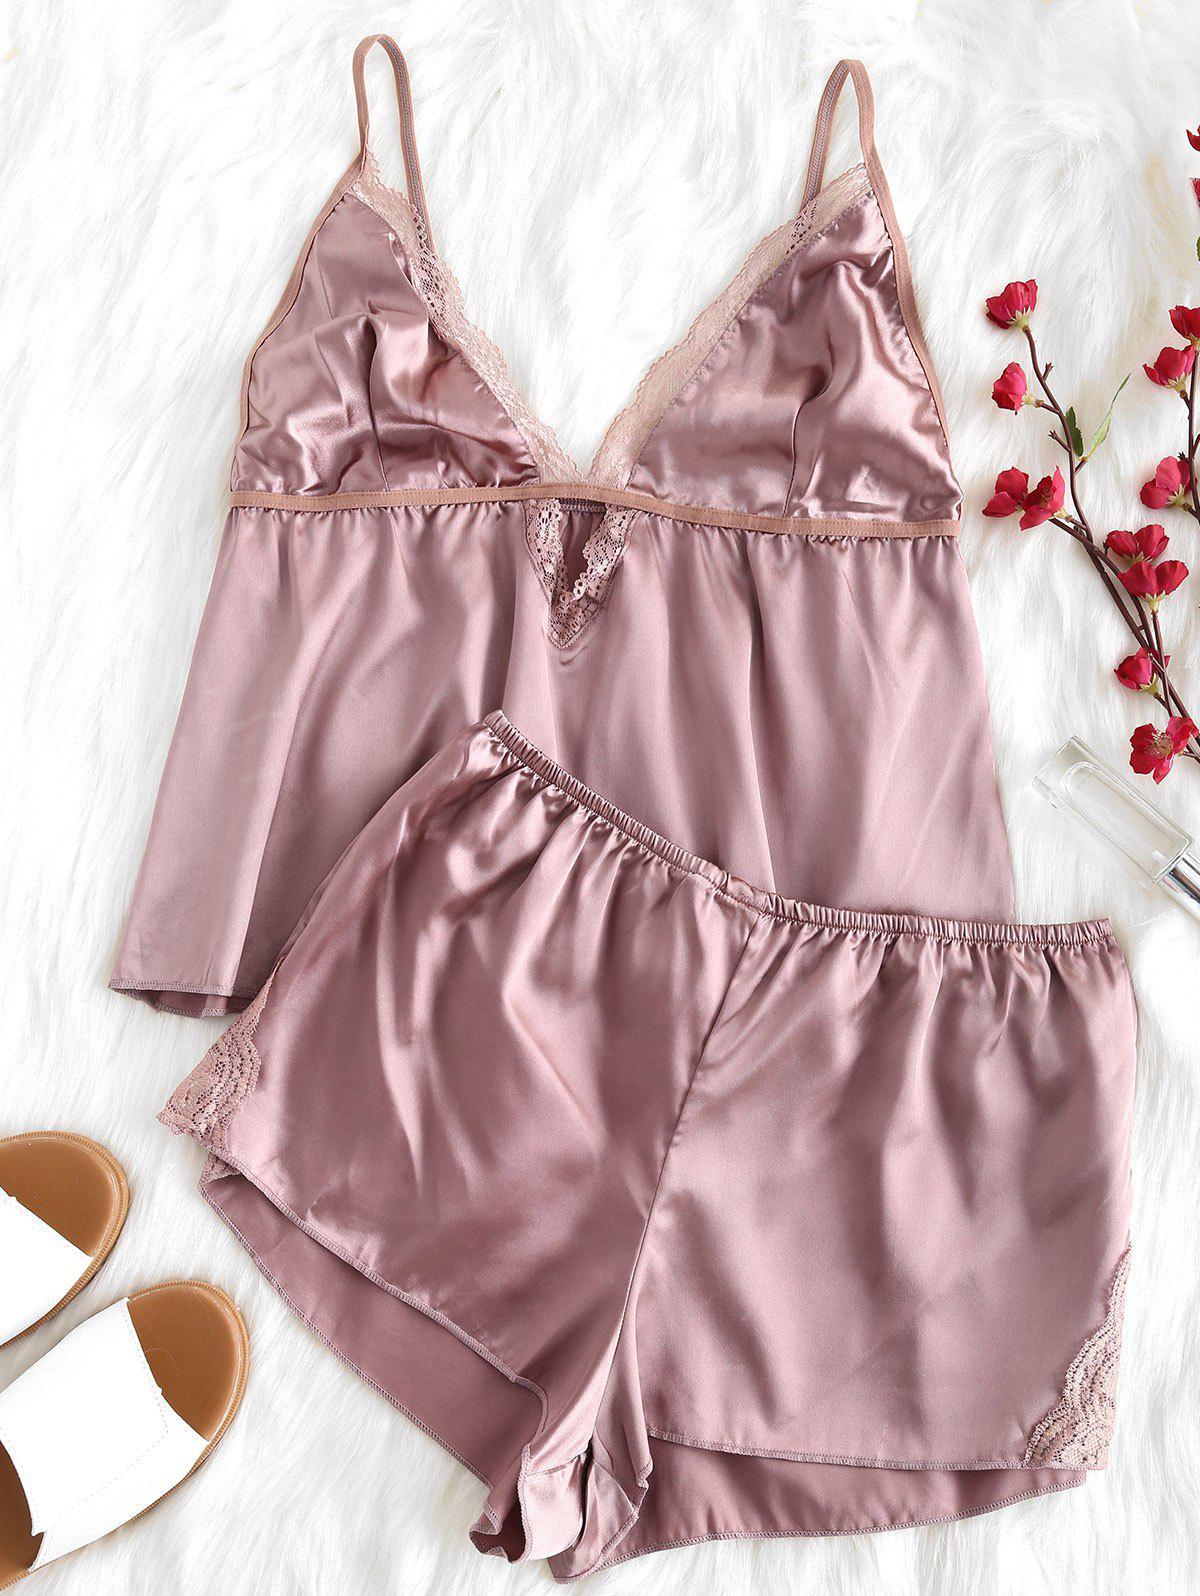 Cami Top and Shorts Pajama Set